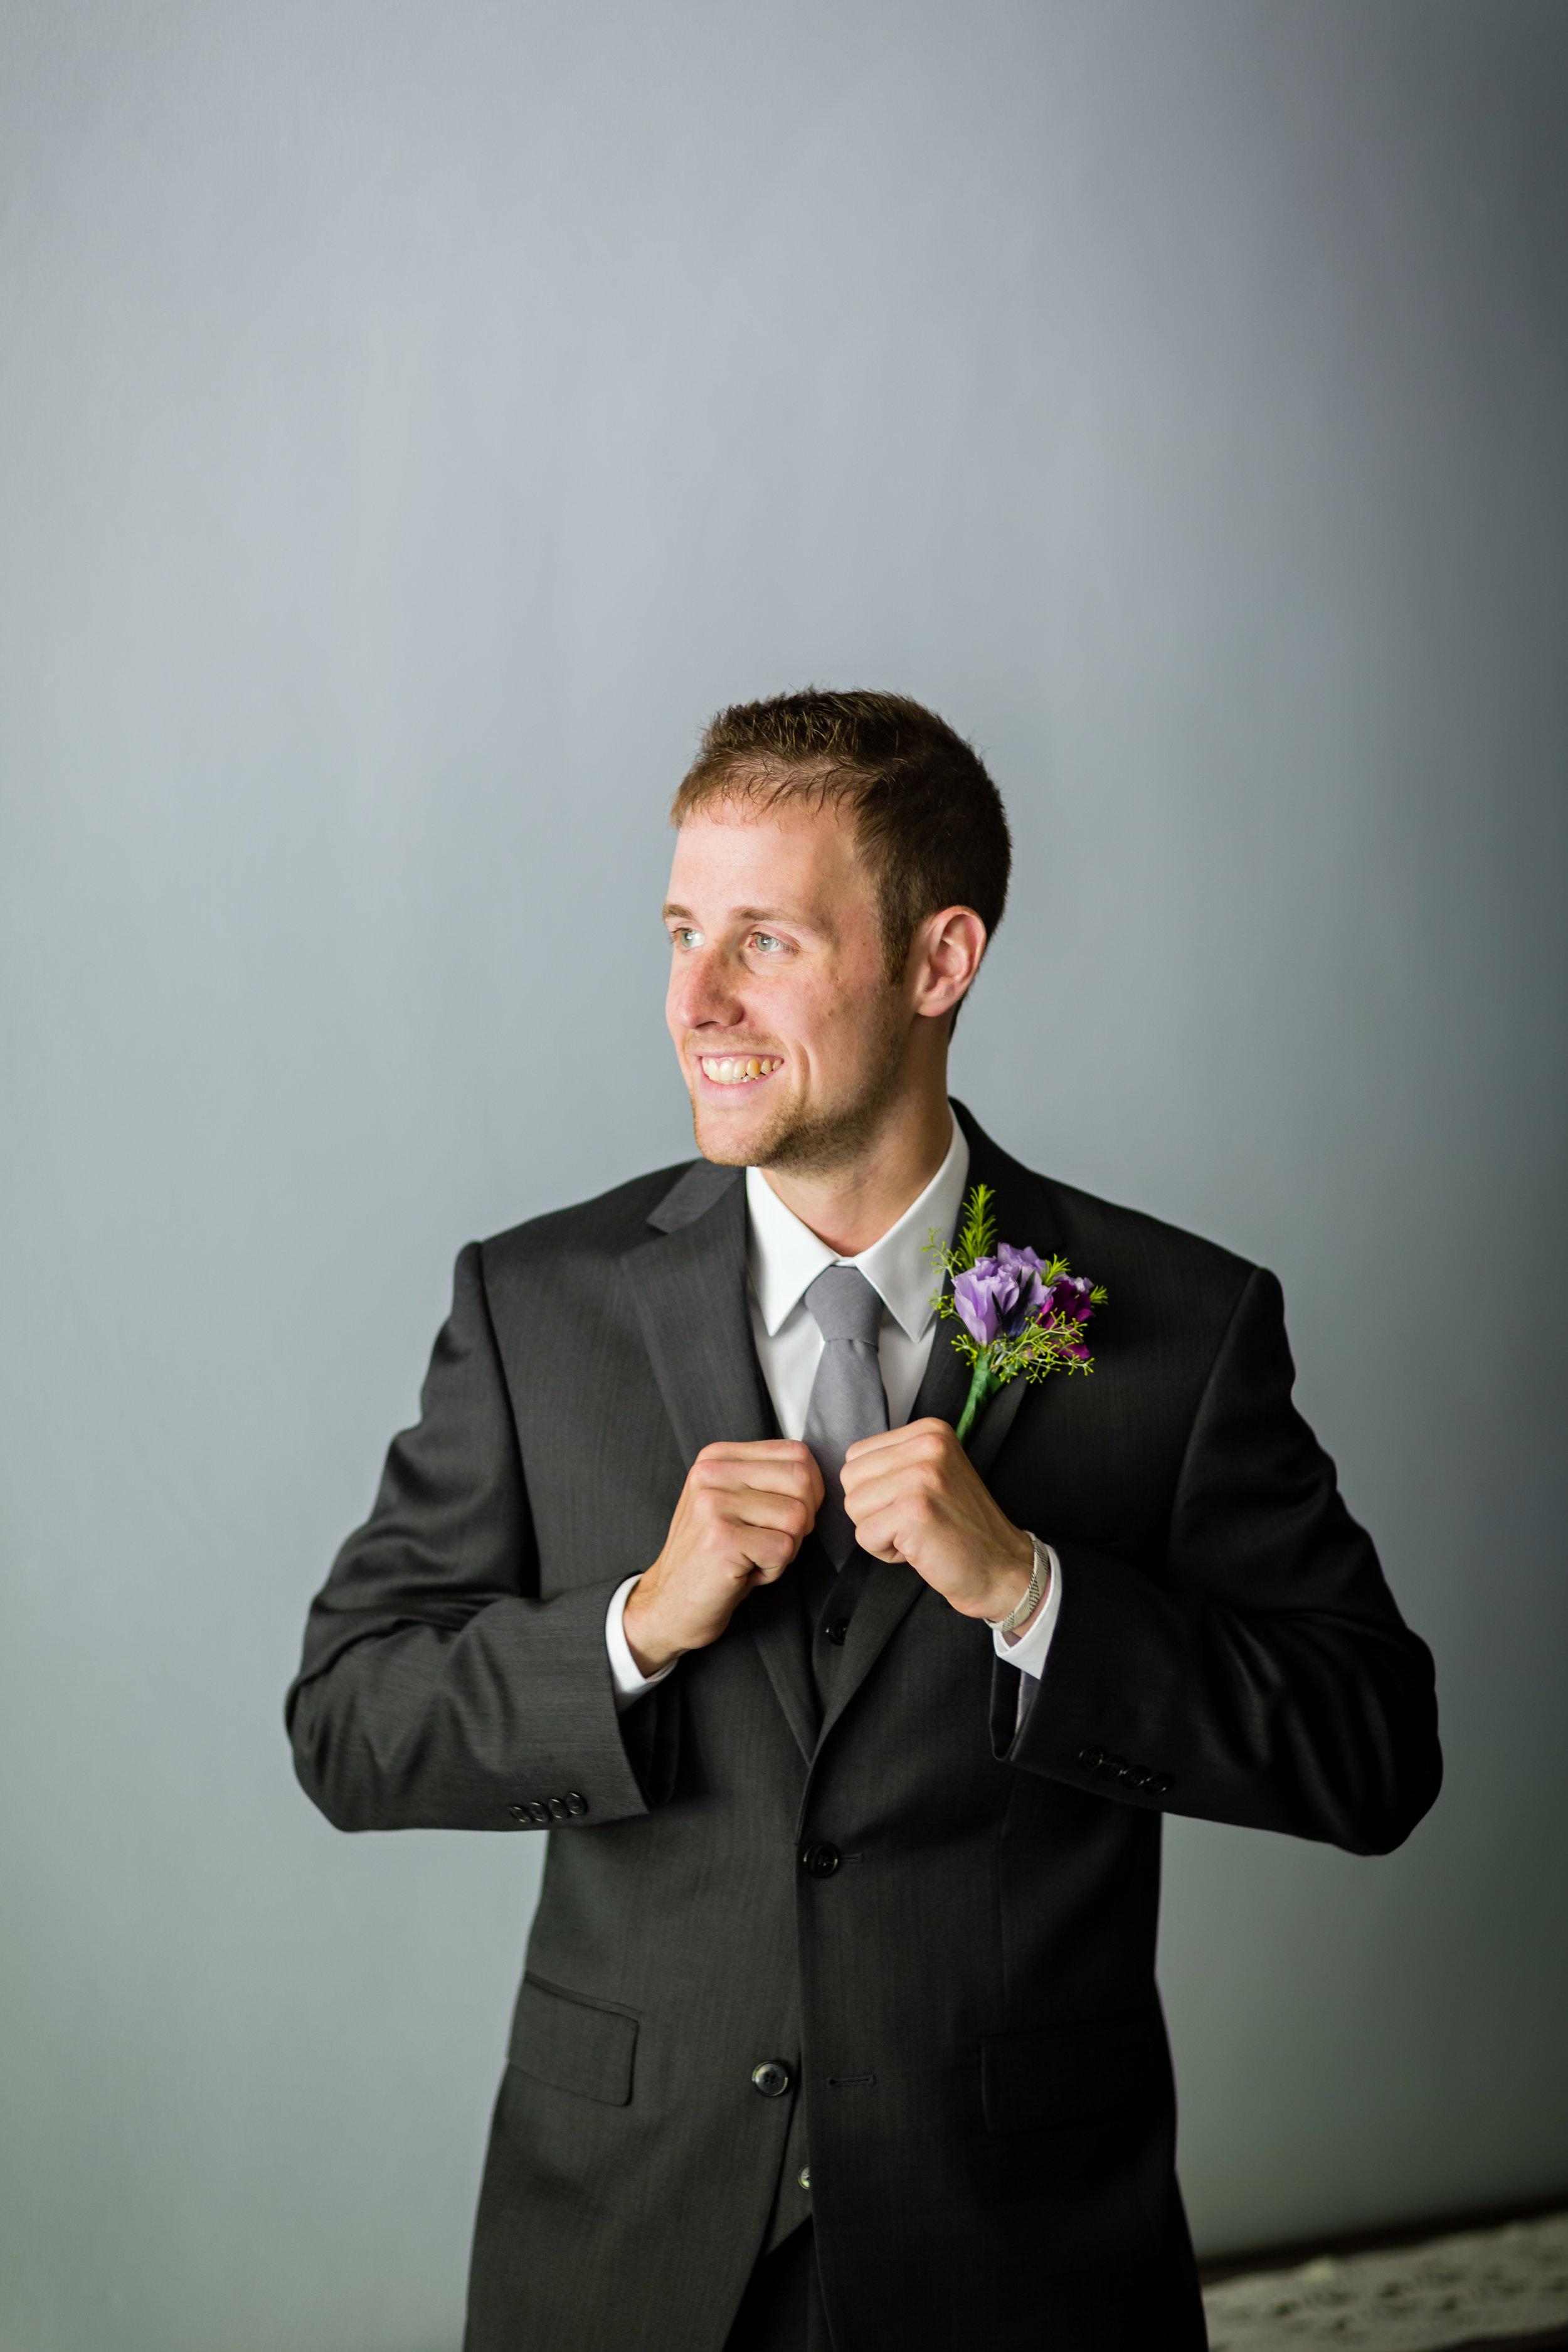 Charcoal Grey Groom Tie - Pittsburgh Wedding Venue - Duquesne University Wedding